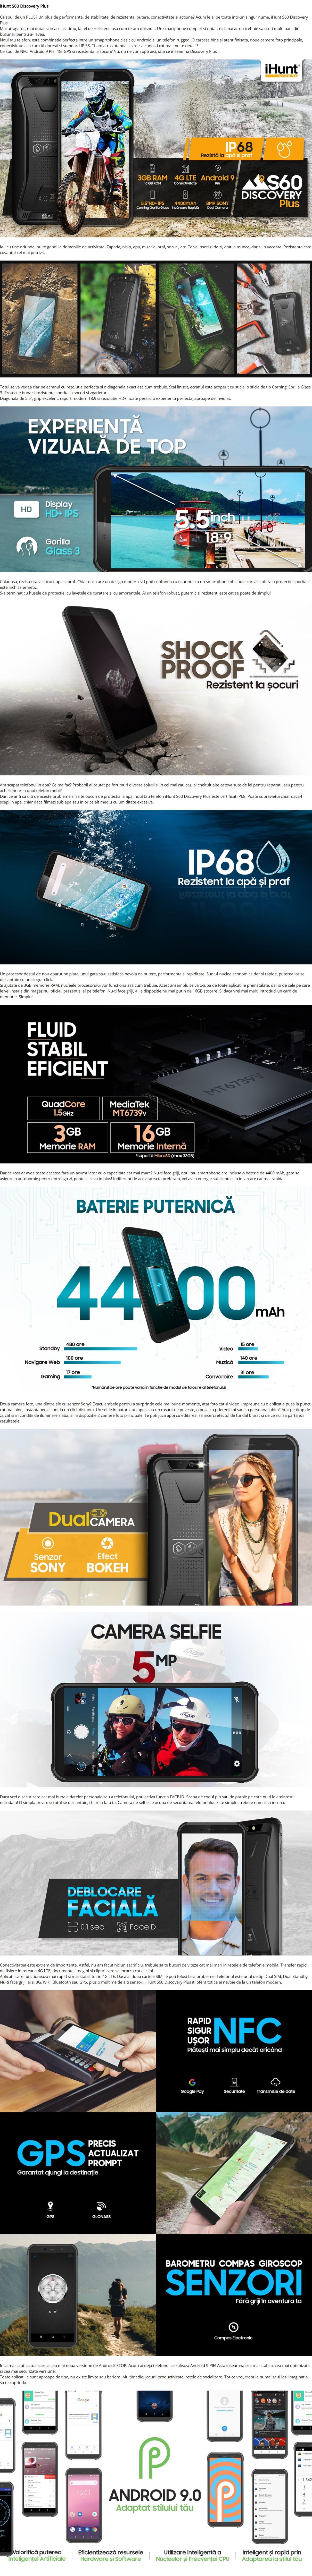 Prezentare-iHunt-S60-Discovery-Plusb9c6f455a5086672.jpg